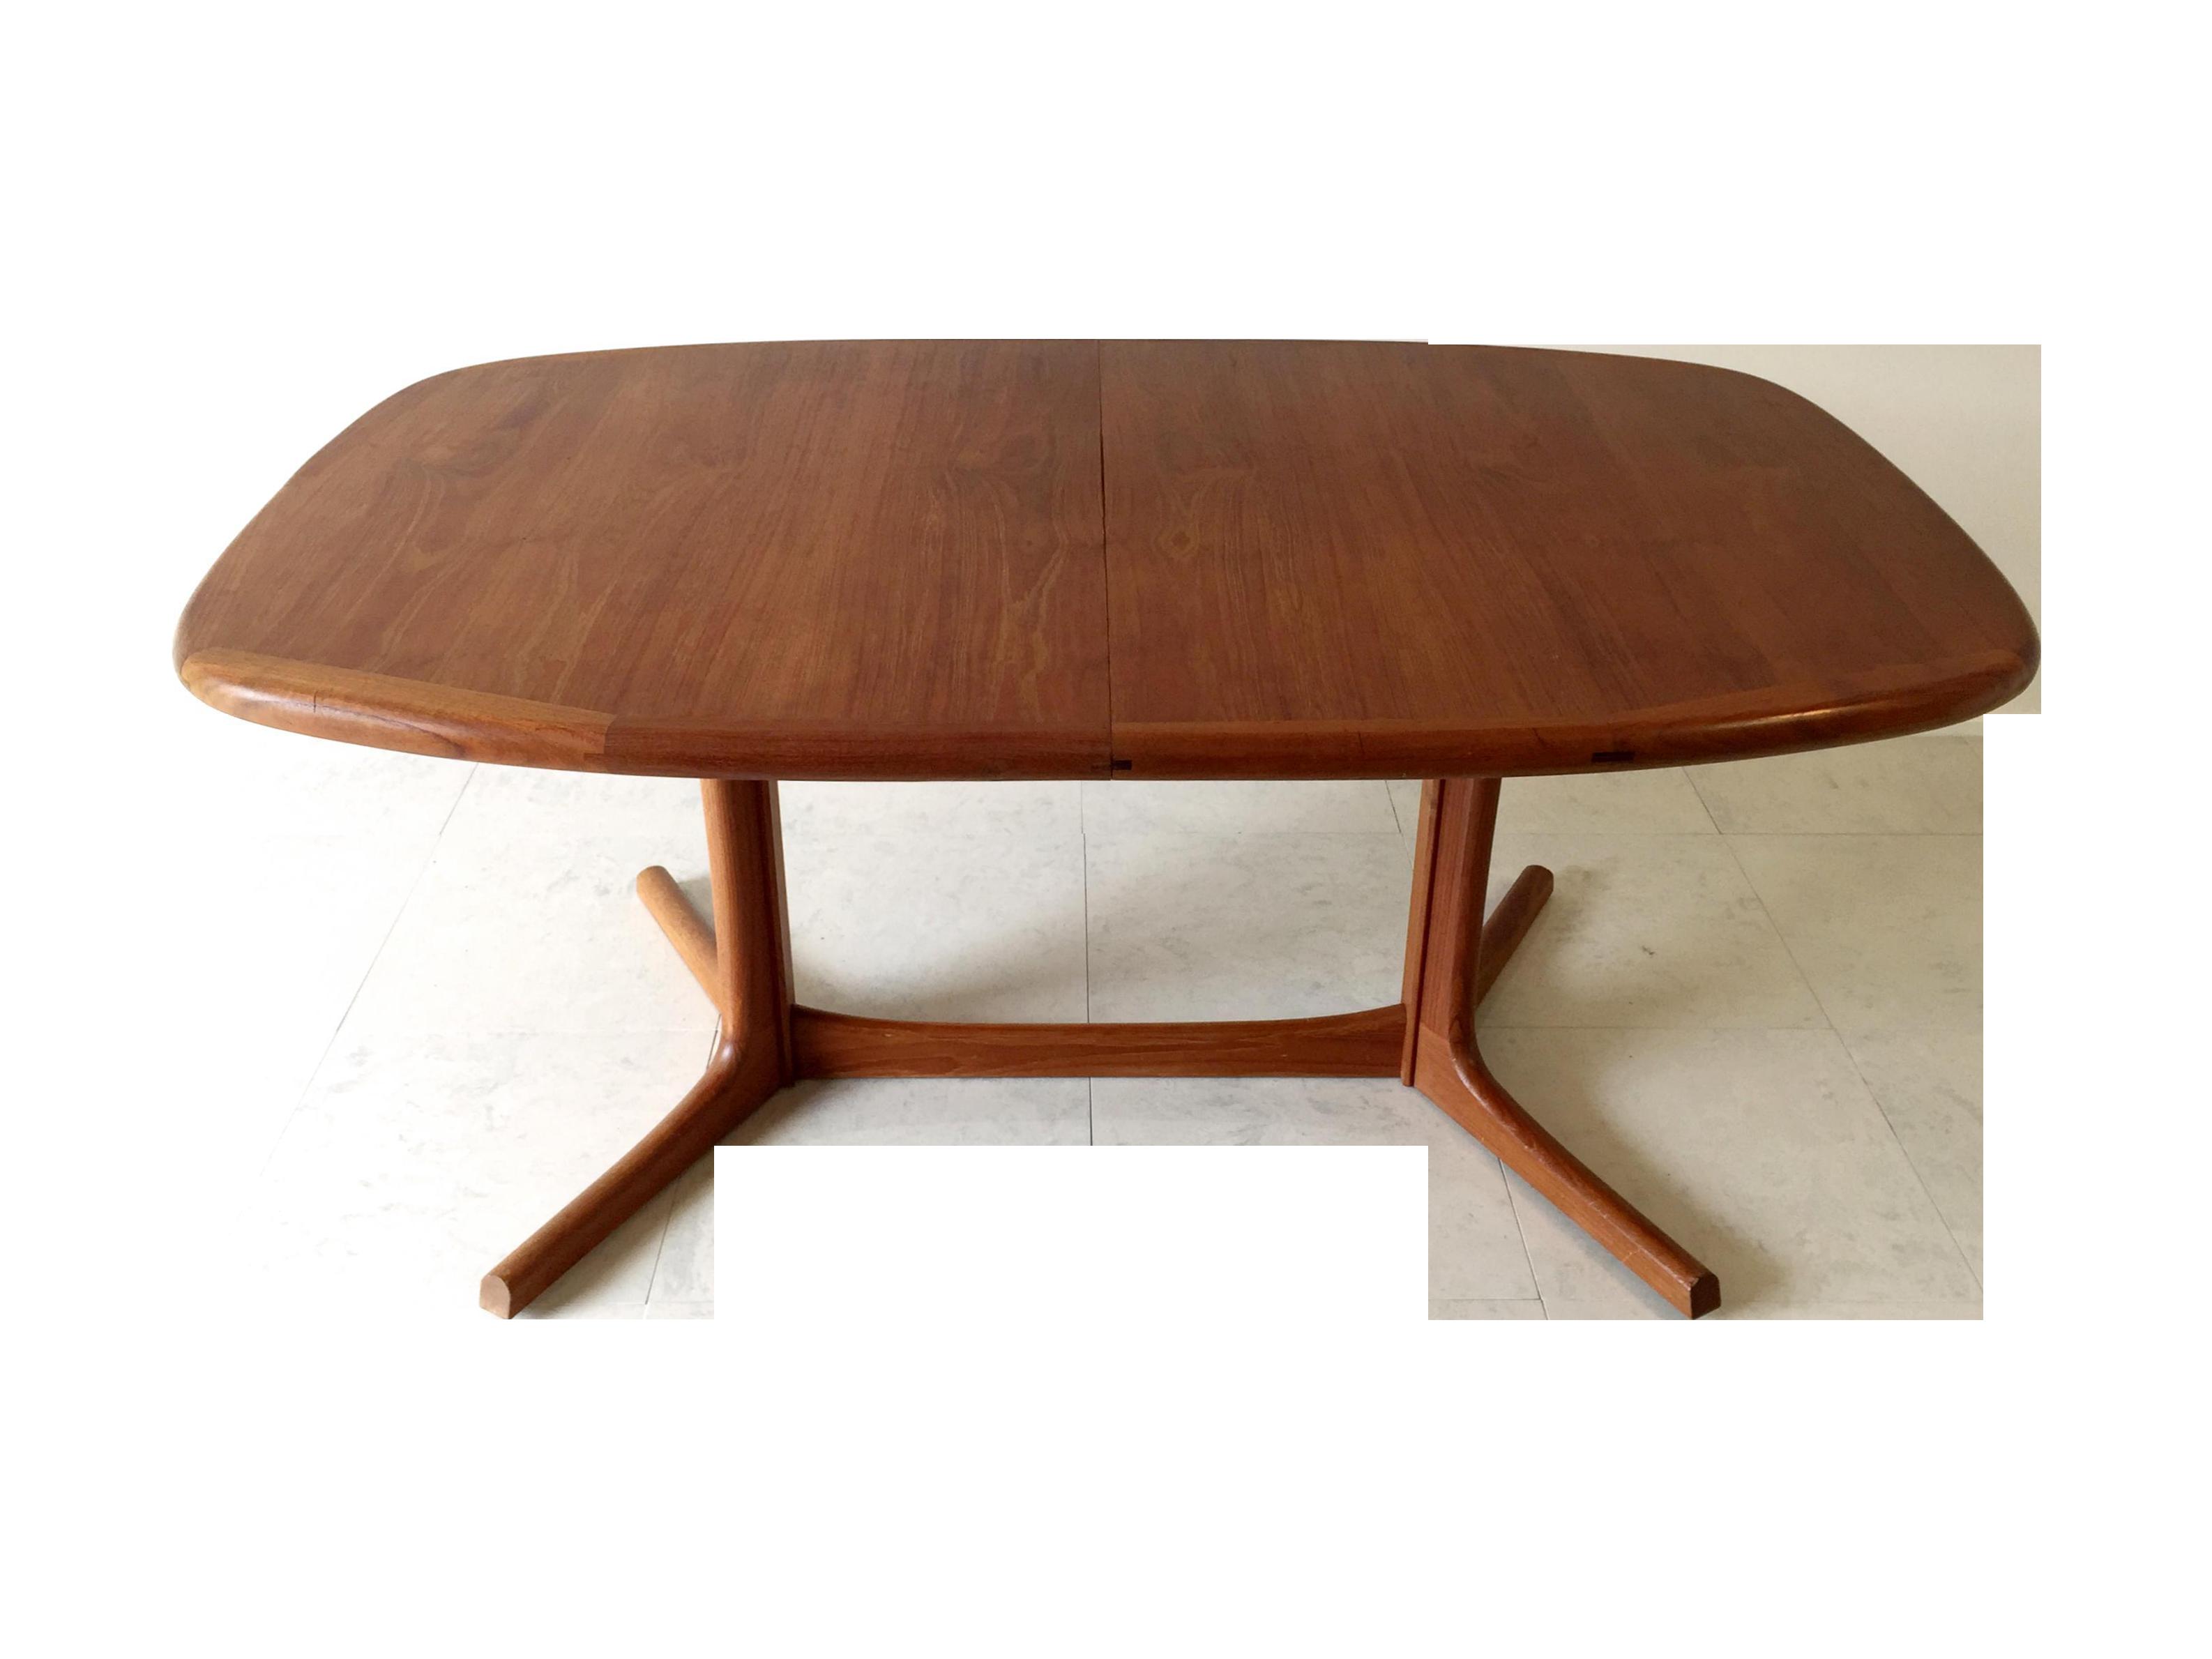 Vintage Danish Dyrlund Teak Dining Table Chairish - Teak oval extending table